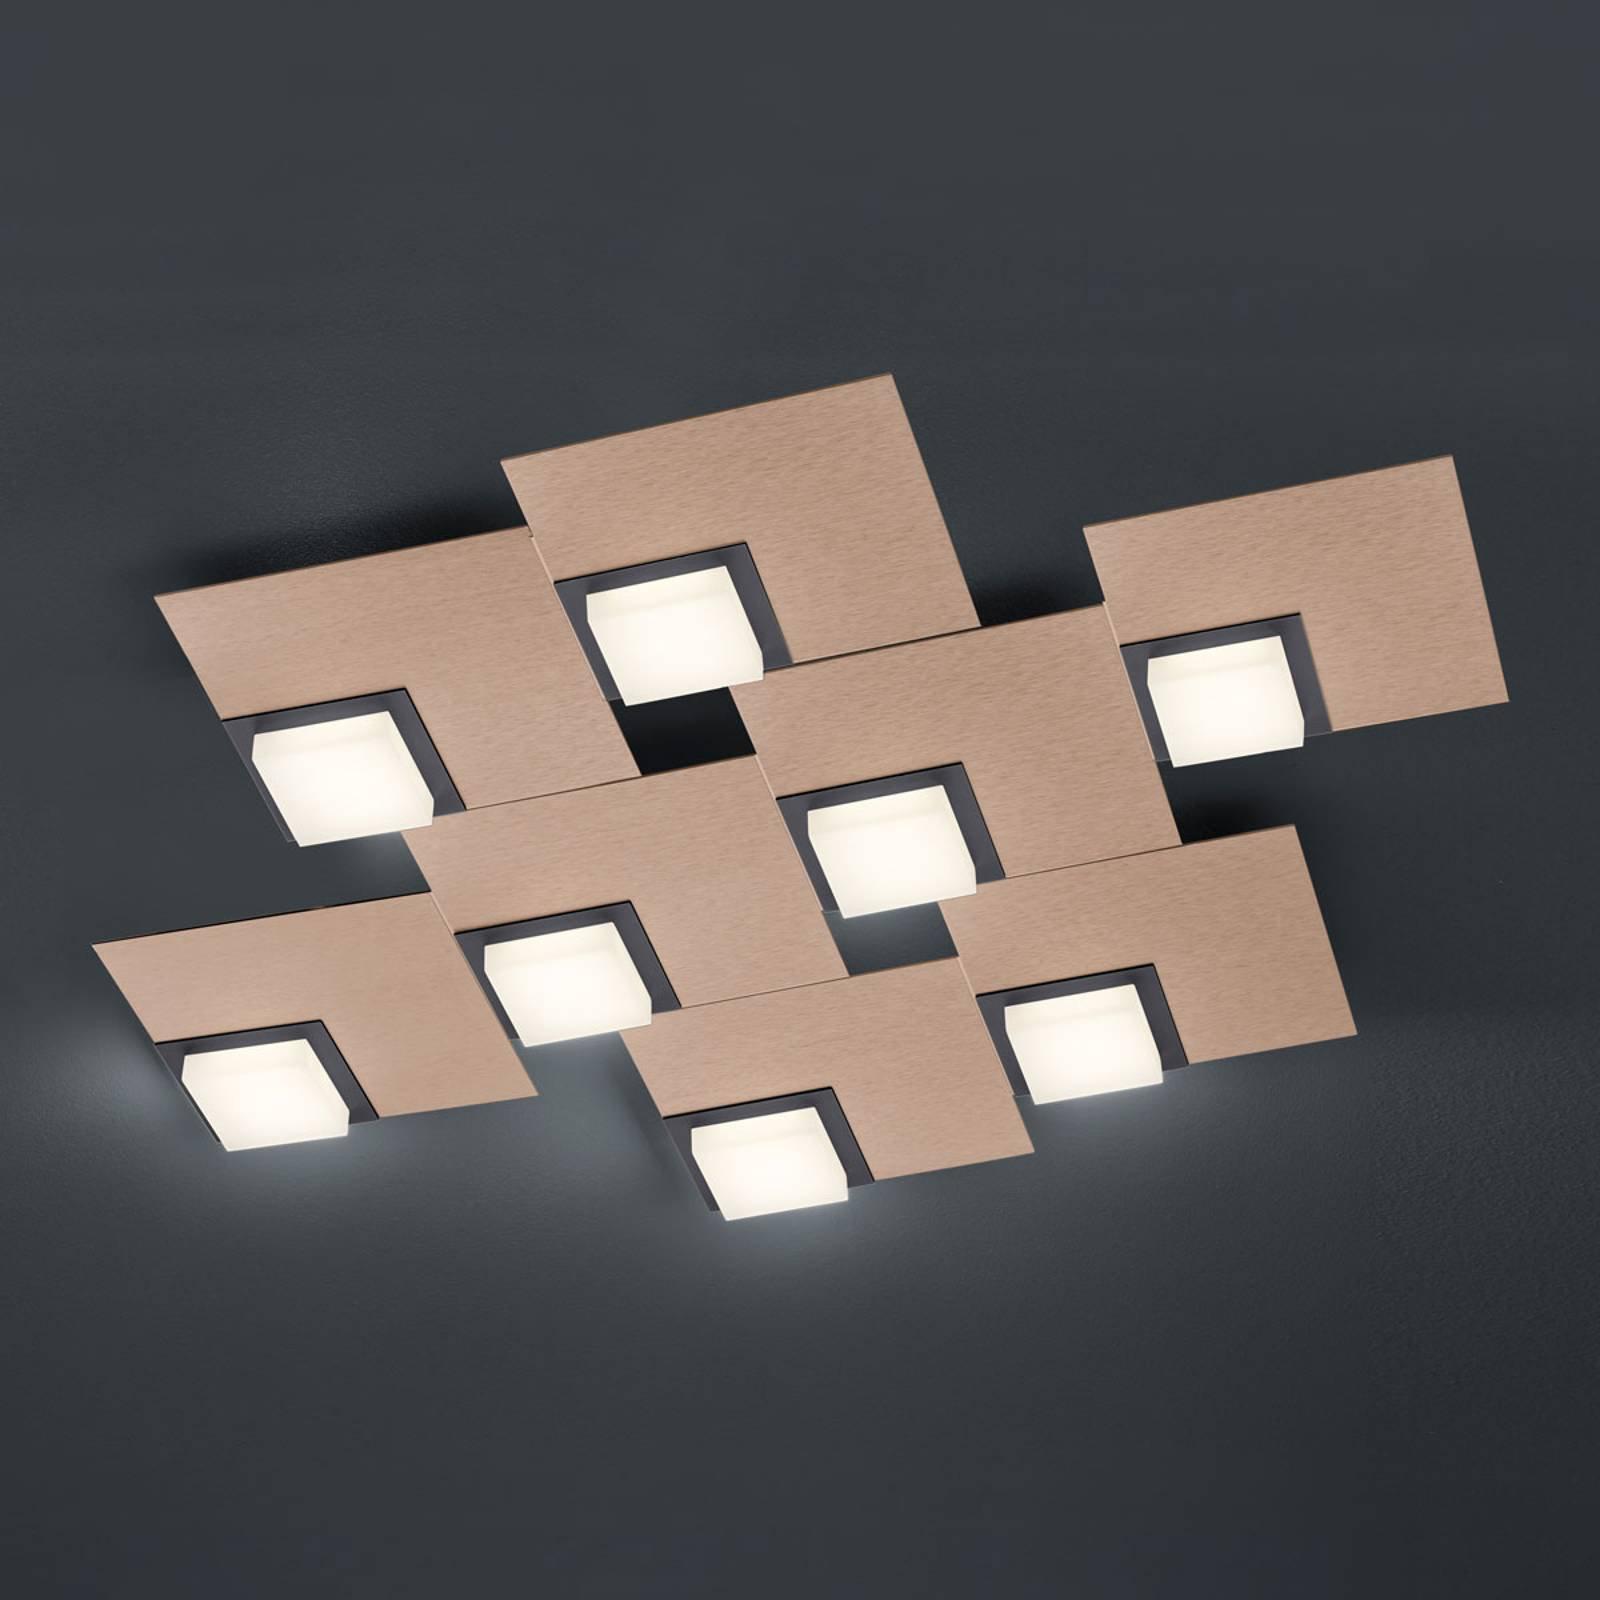 BANKAMP Quadro LED-taklampe 64 W, roségull